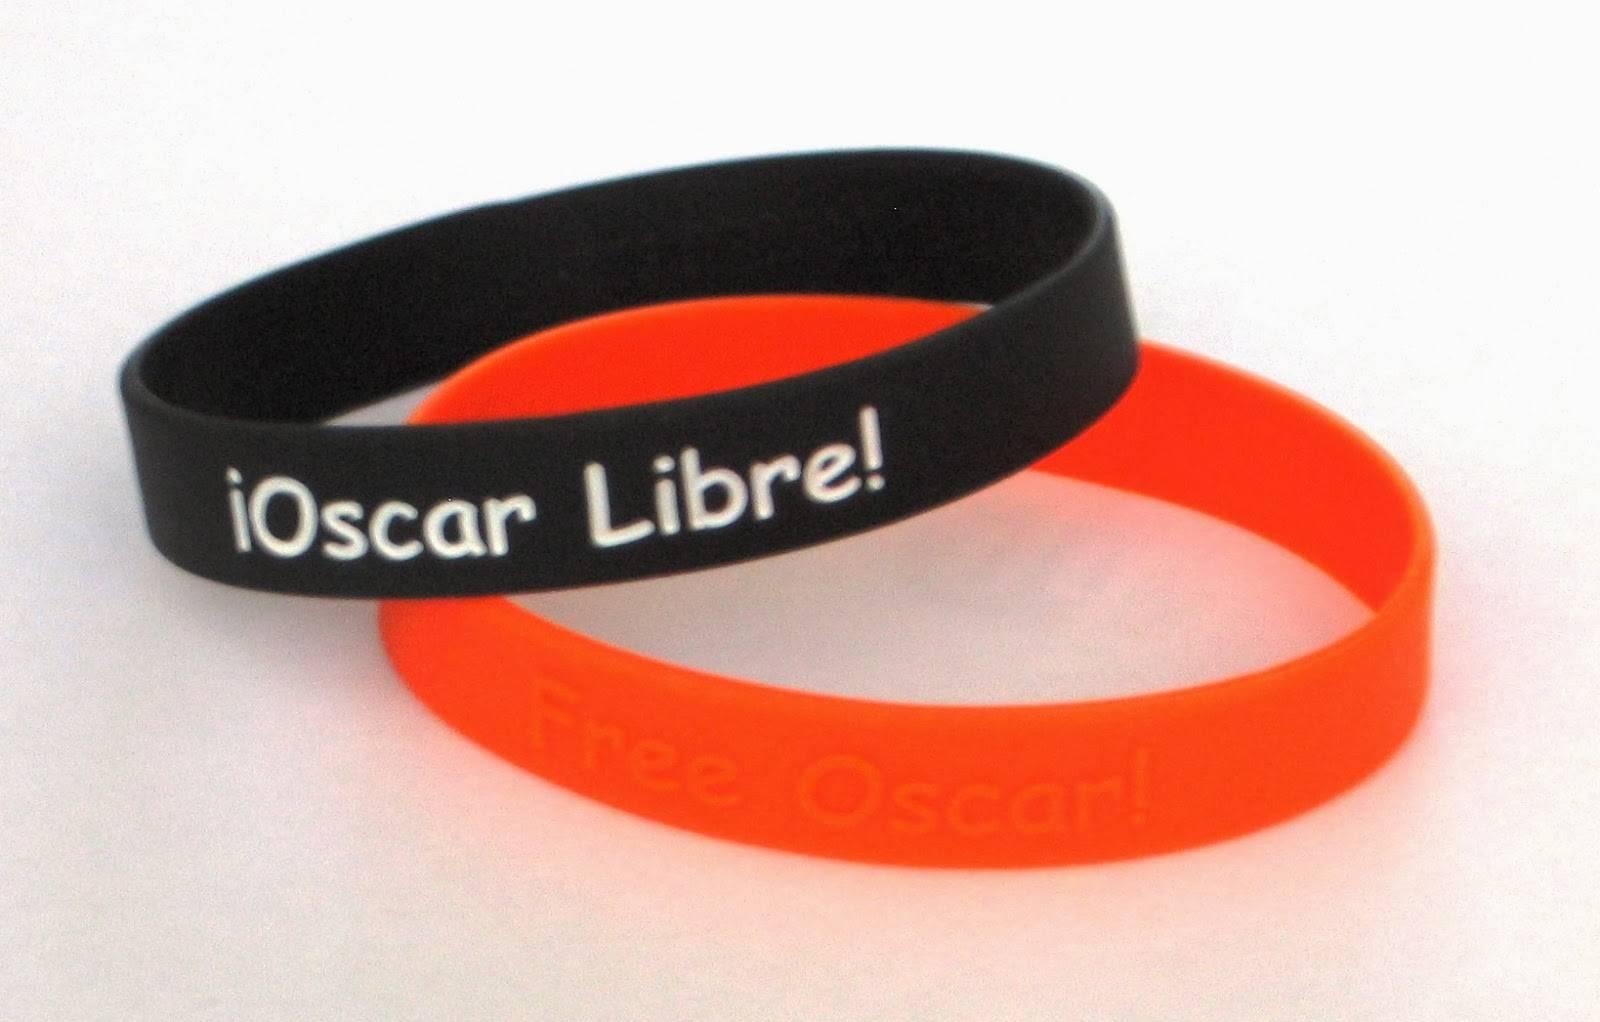 oscarbracelet-5b5b622ad33e703d05e124f7a91ecde2.jpg